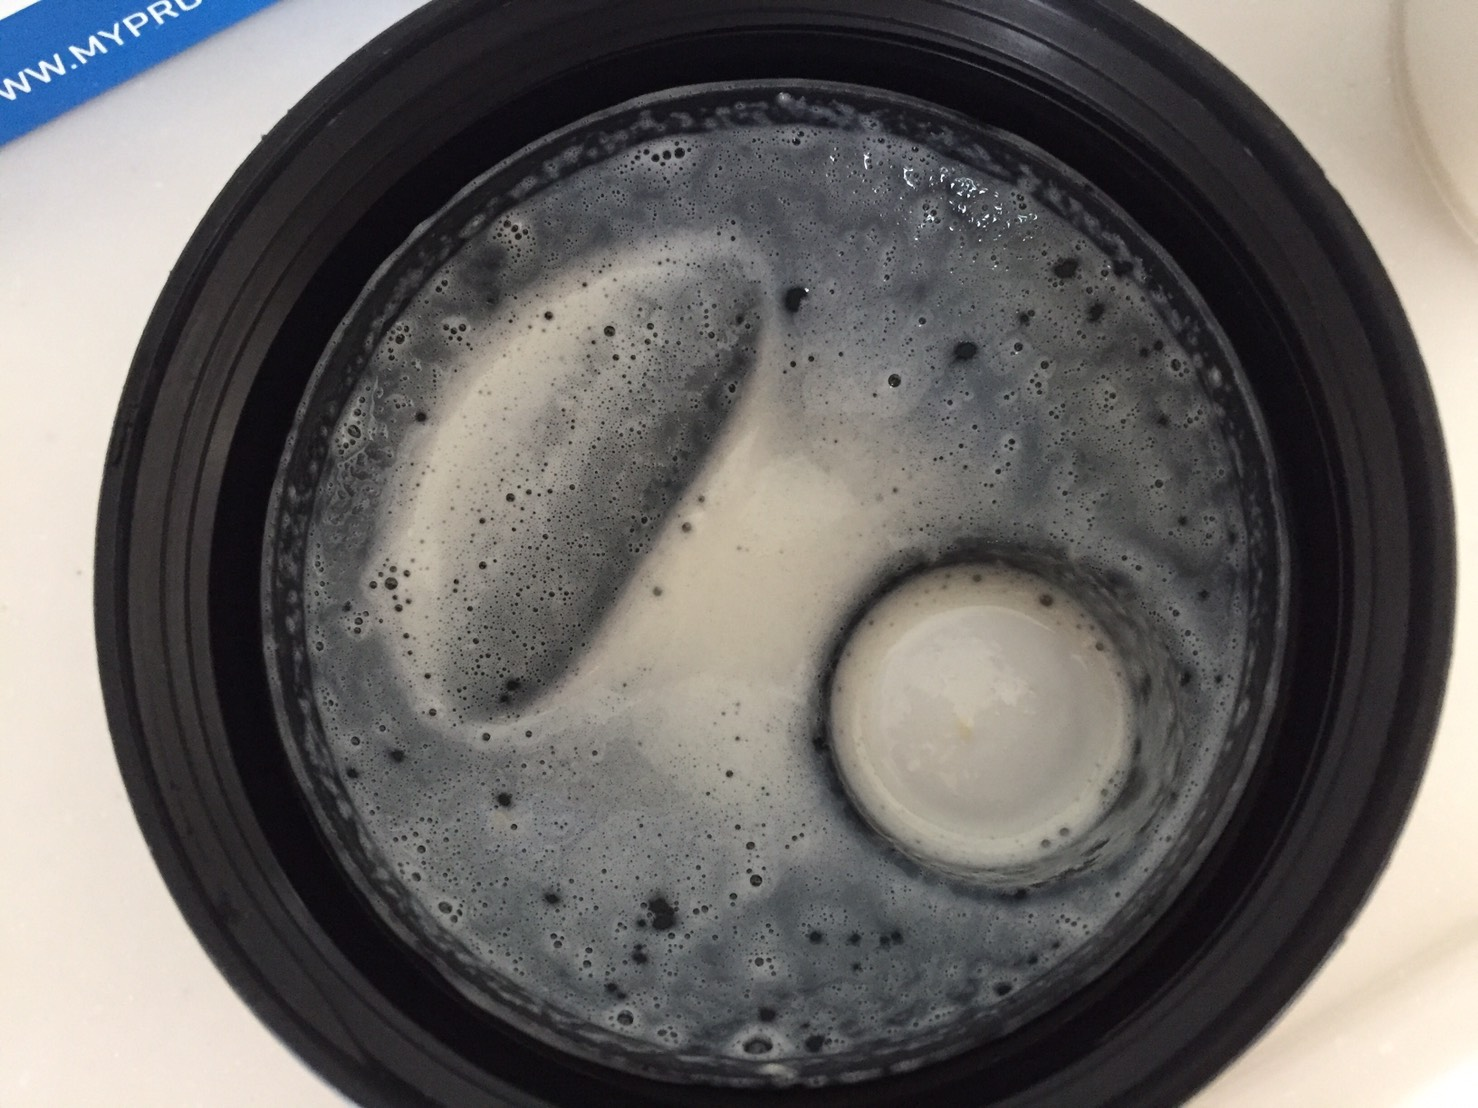 【WPC】Impactホエイプロテイン「Natural Vanilla(ナチュラルバニラ味)」をシェイクした直後の様子。蓋側